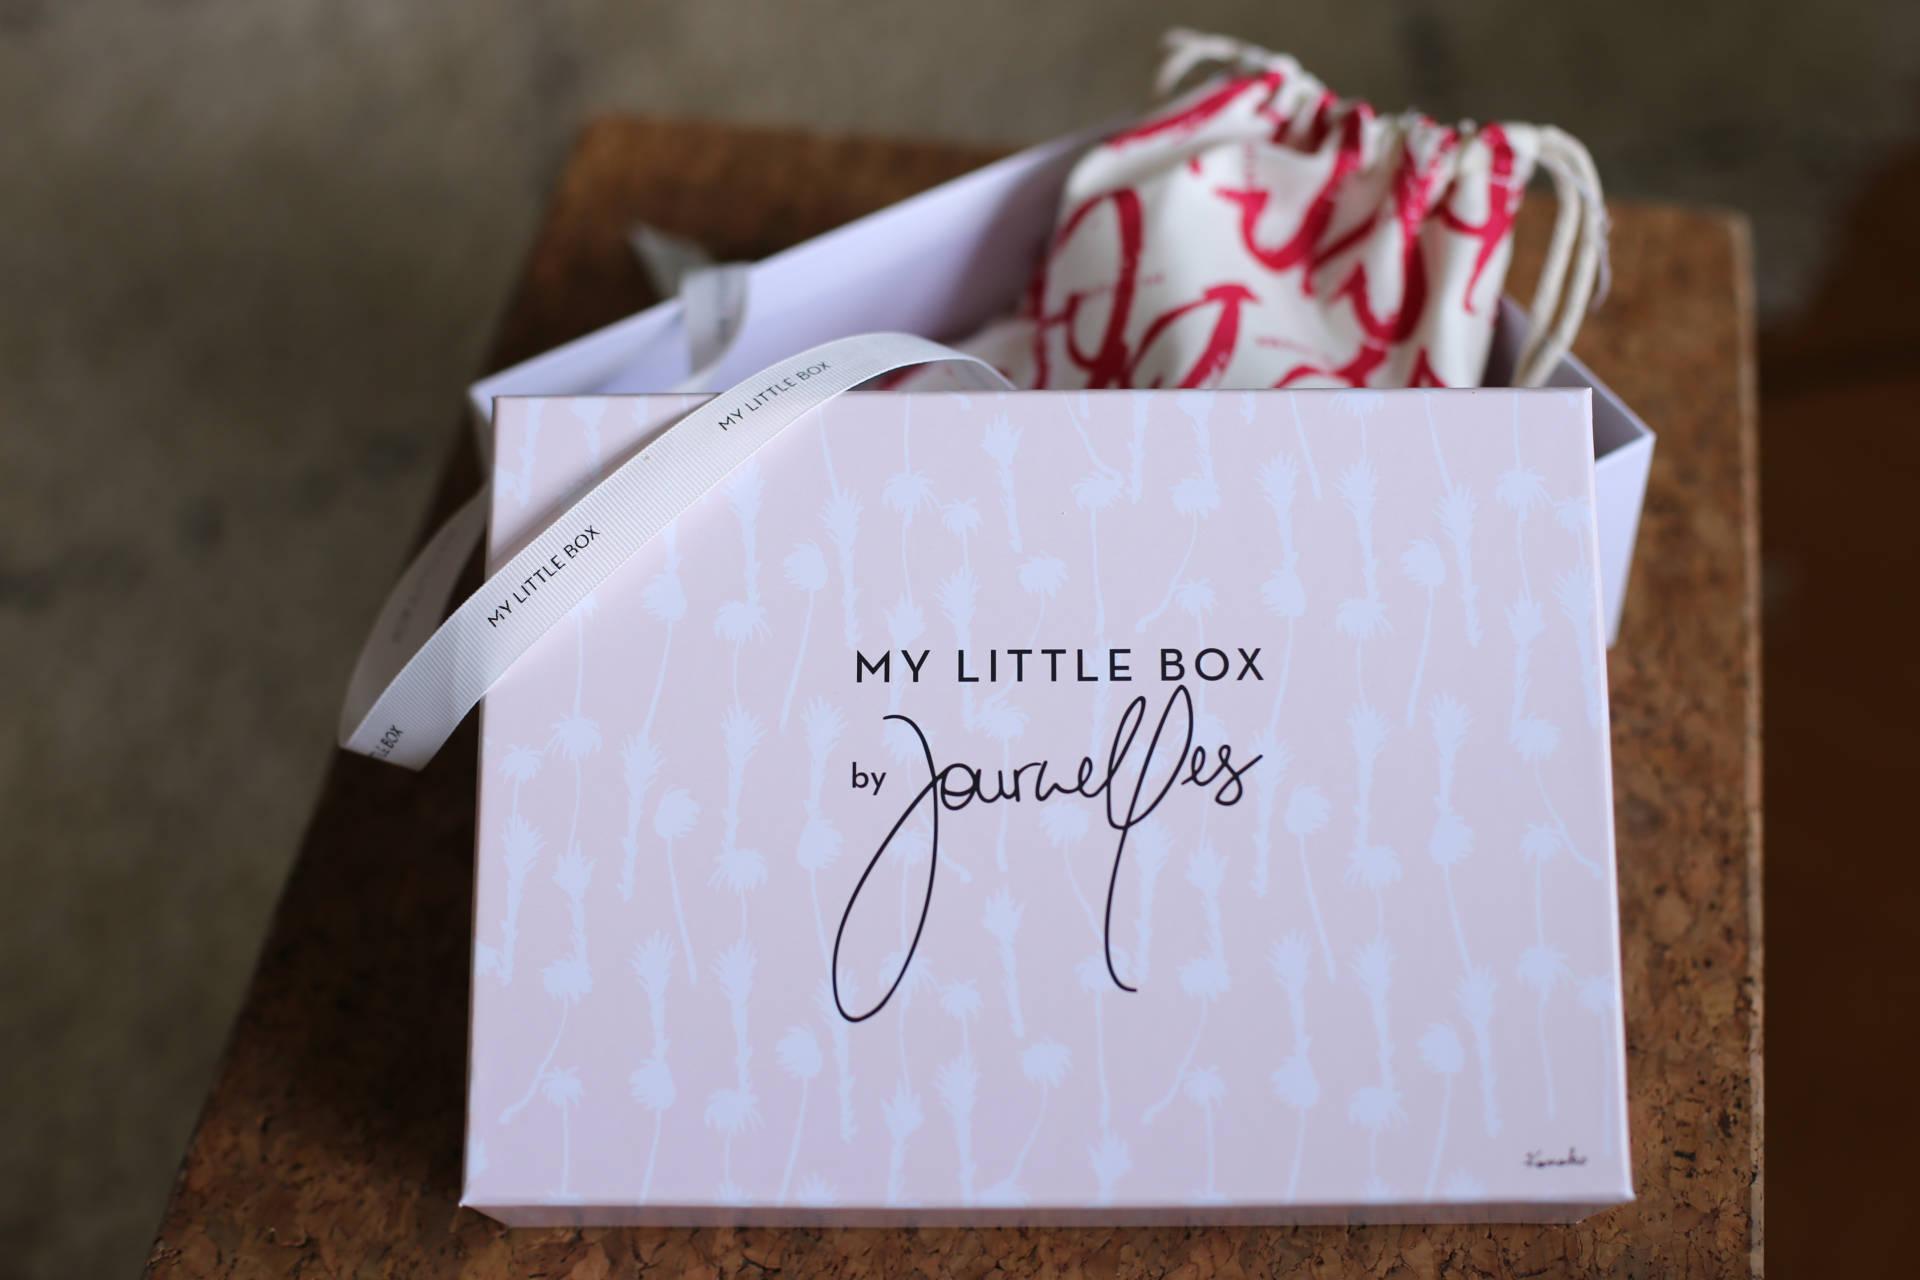 mylittlebox-journelles3